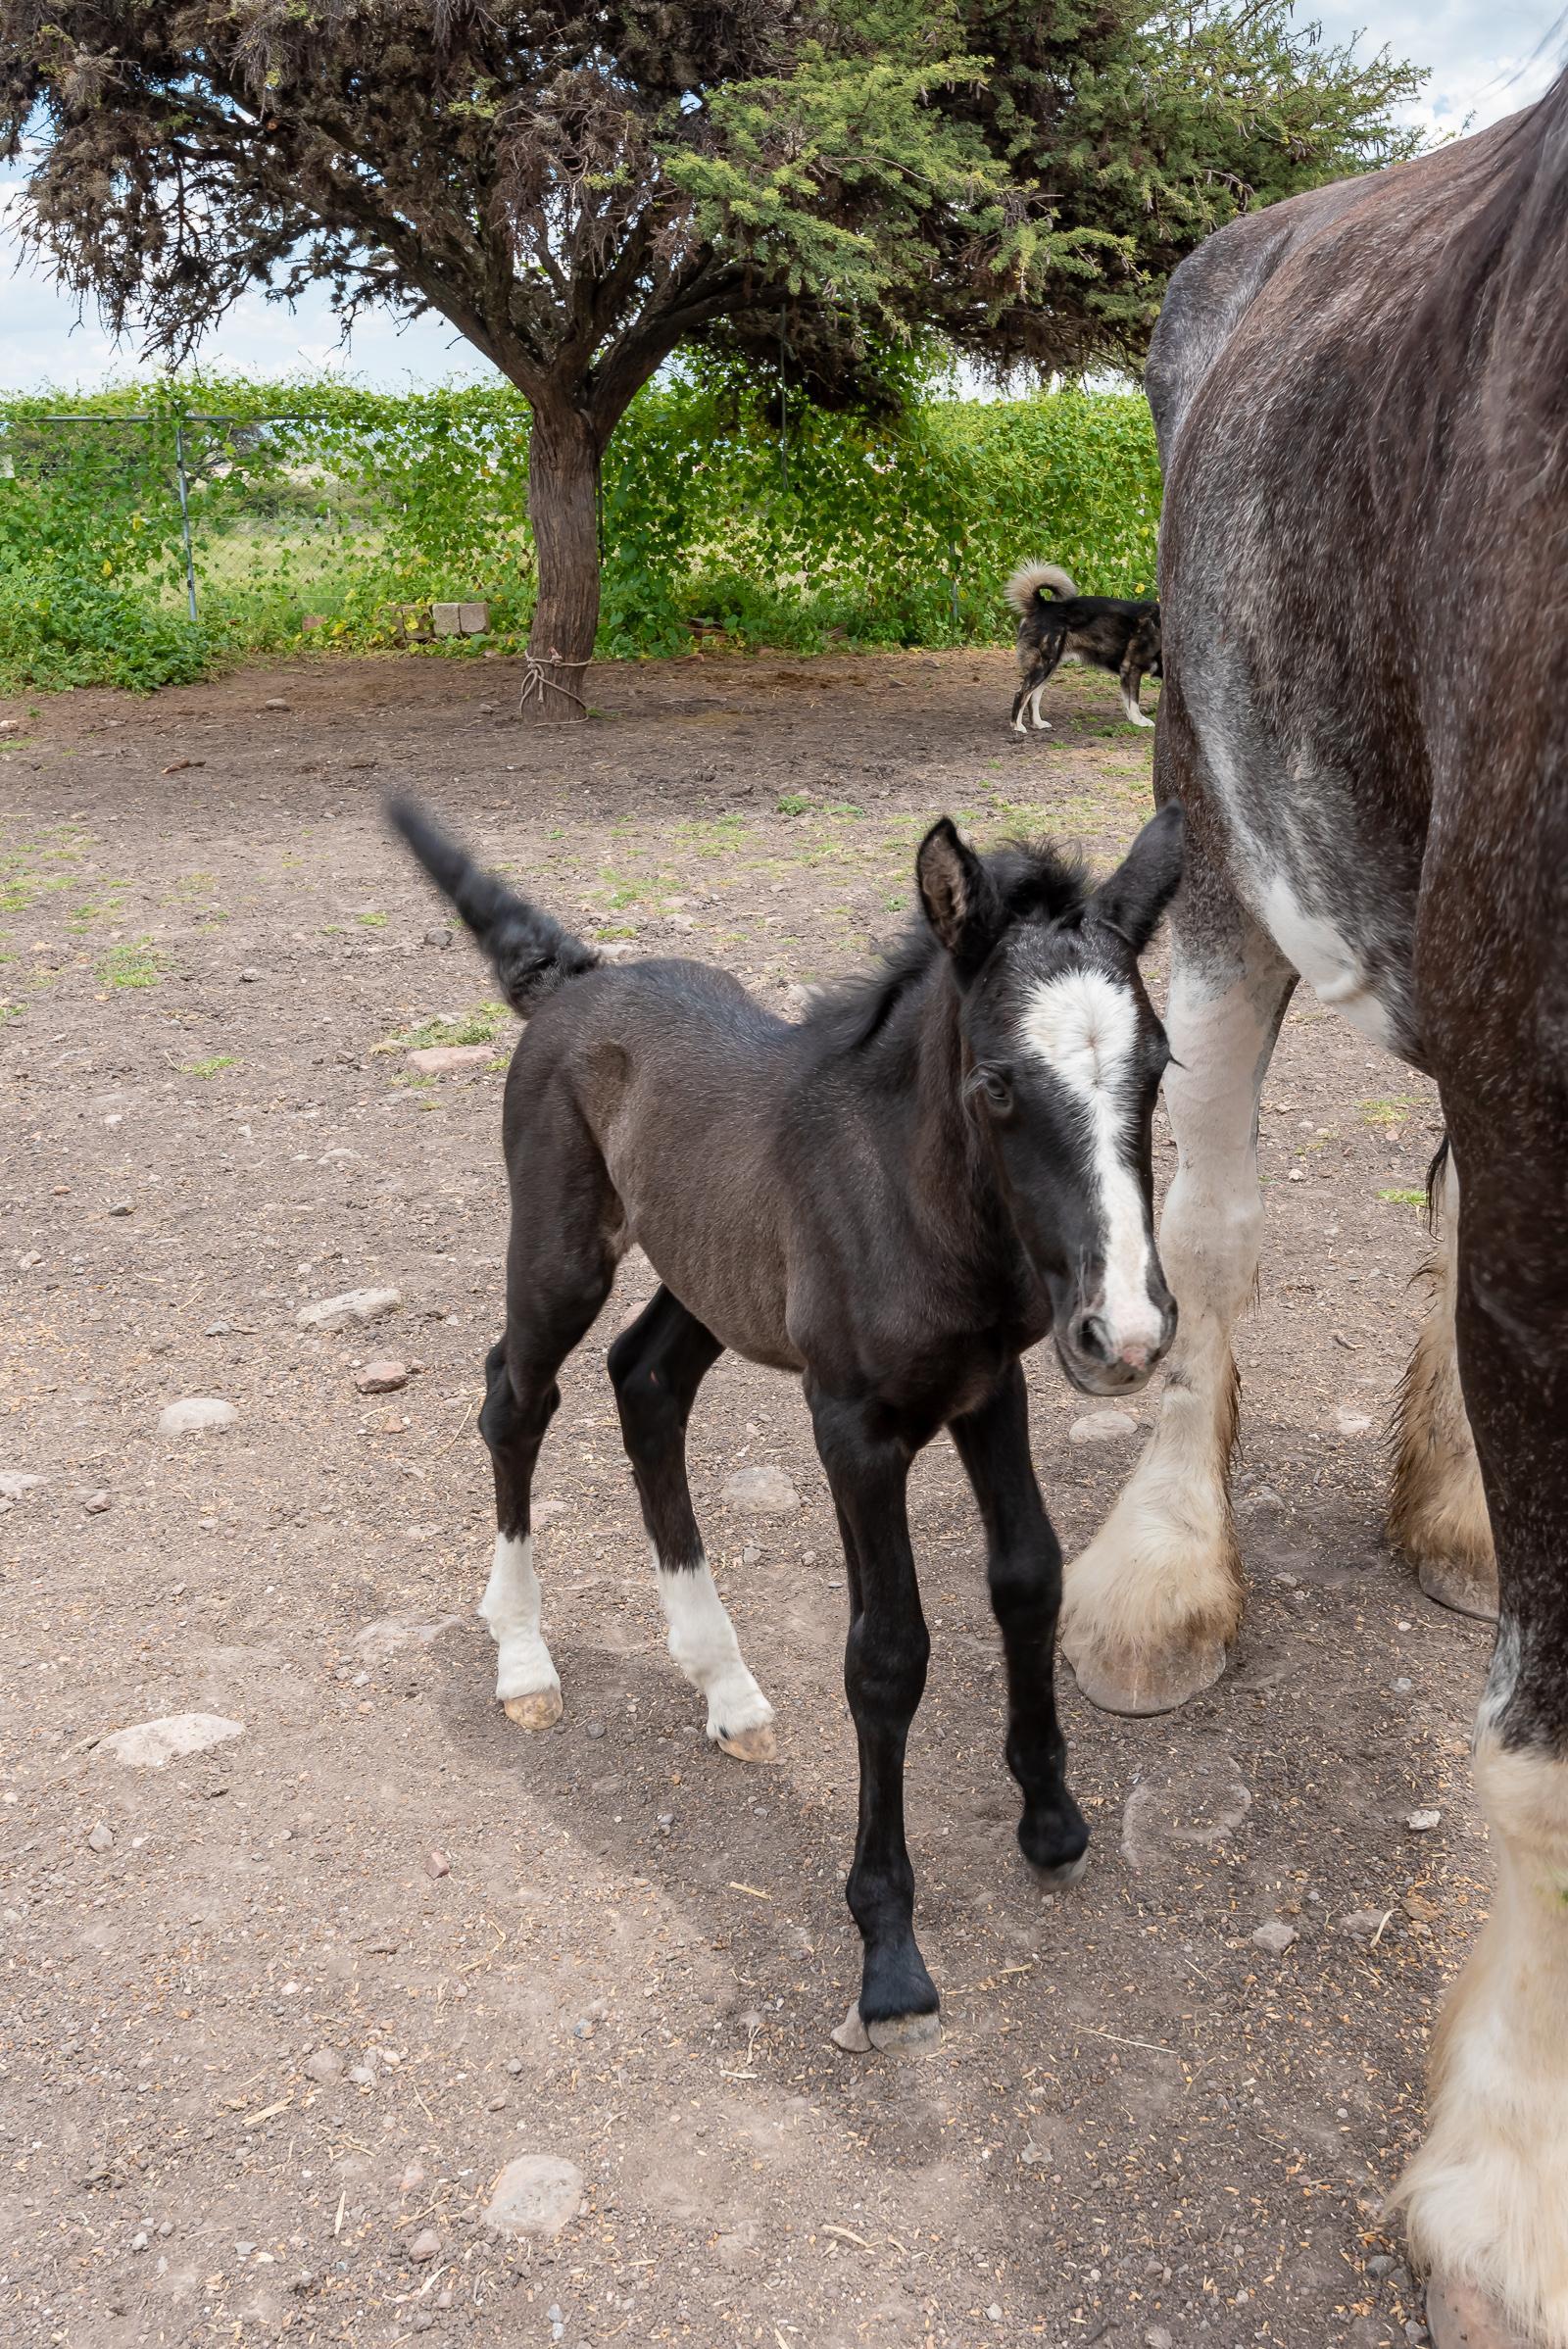 Horse Rescue SMA San Miguel de Allende Mexico